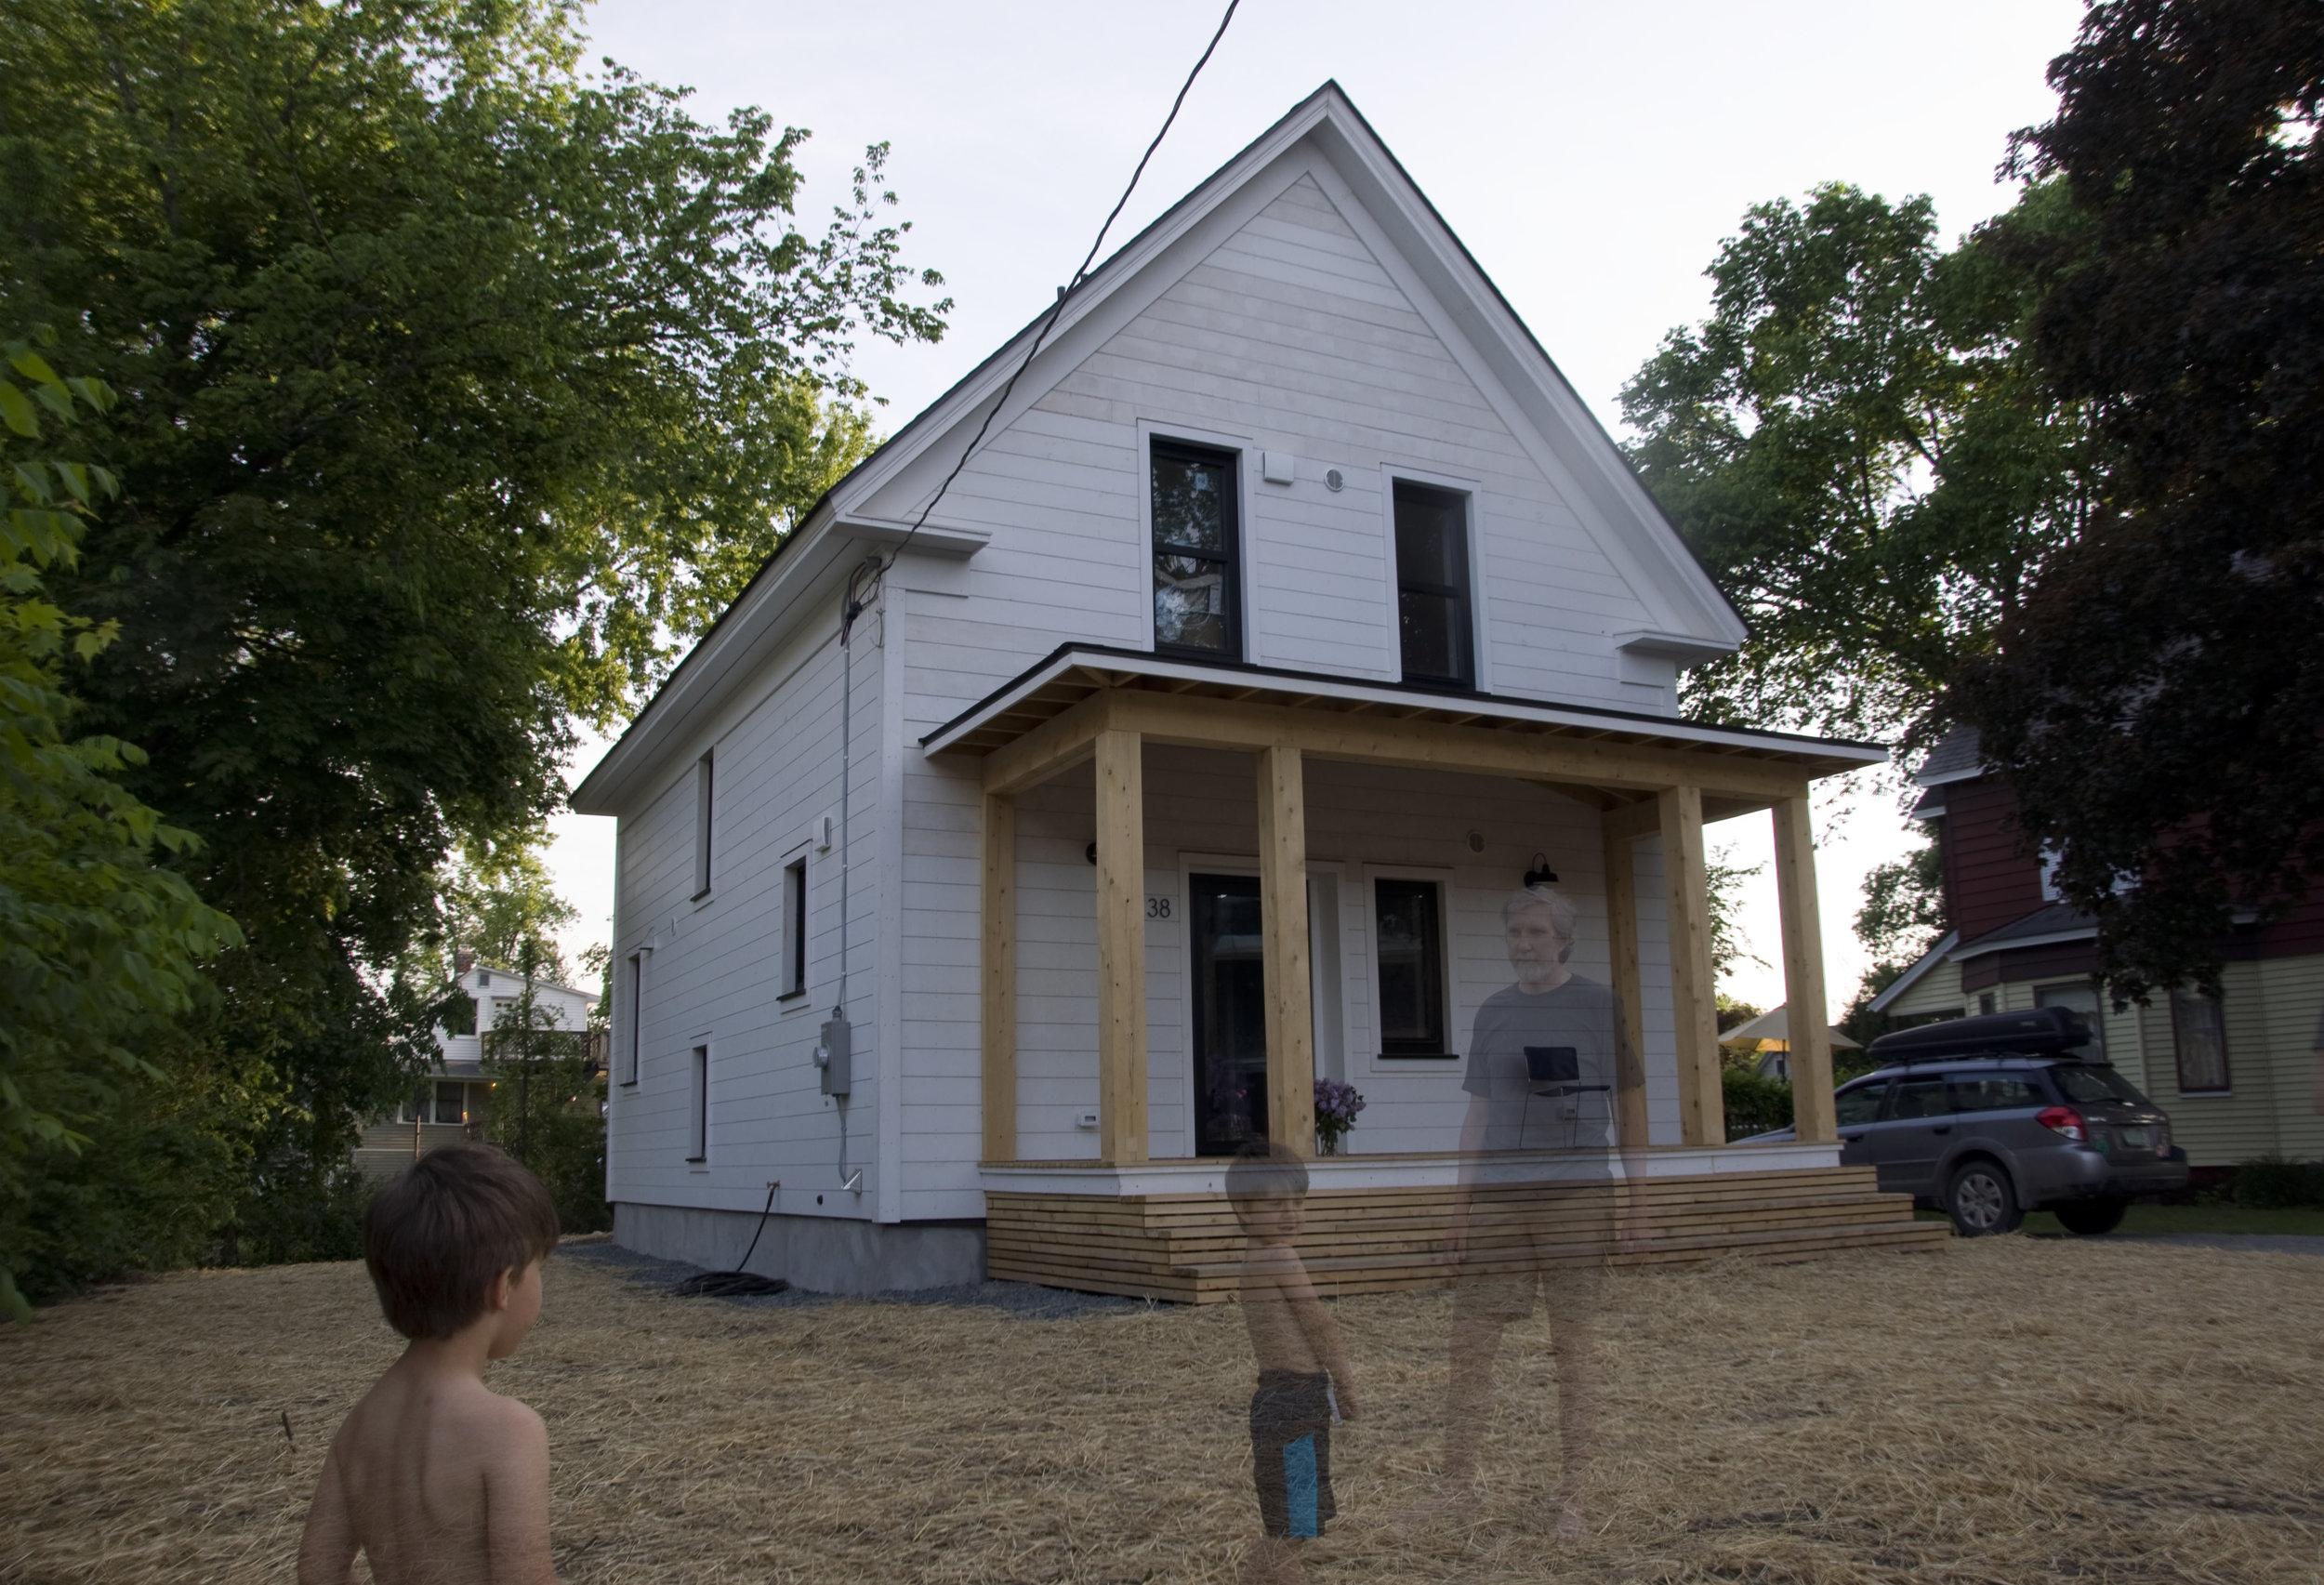 New Modern Compact Farmhouse in a suburban environment.